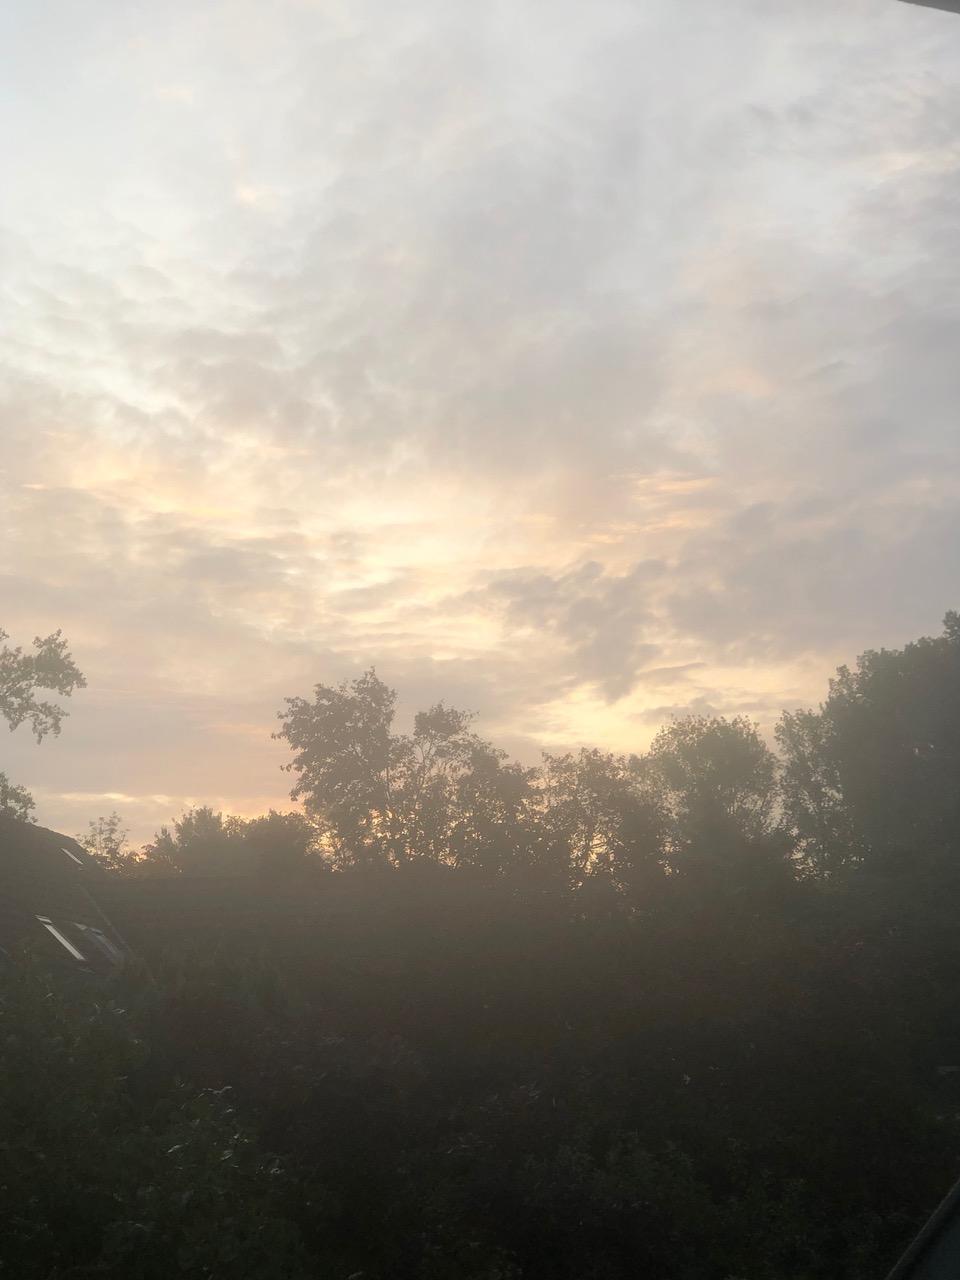 Herbsthimmel - Arztlastig - Freitagszeuch